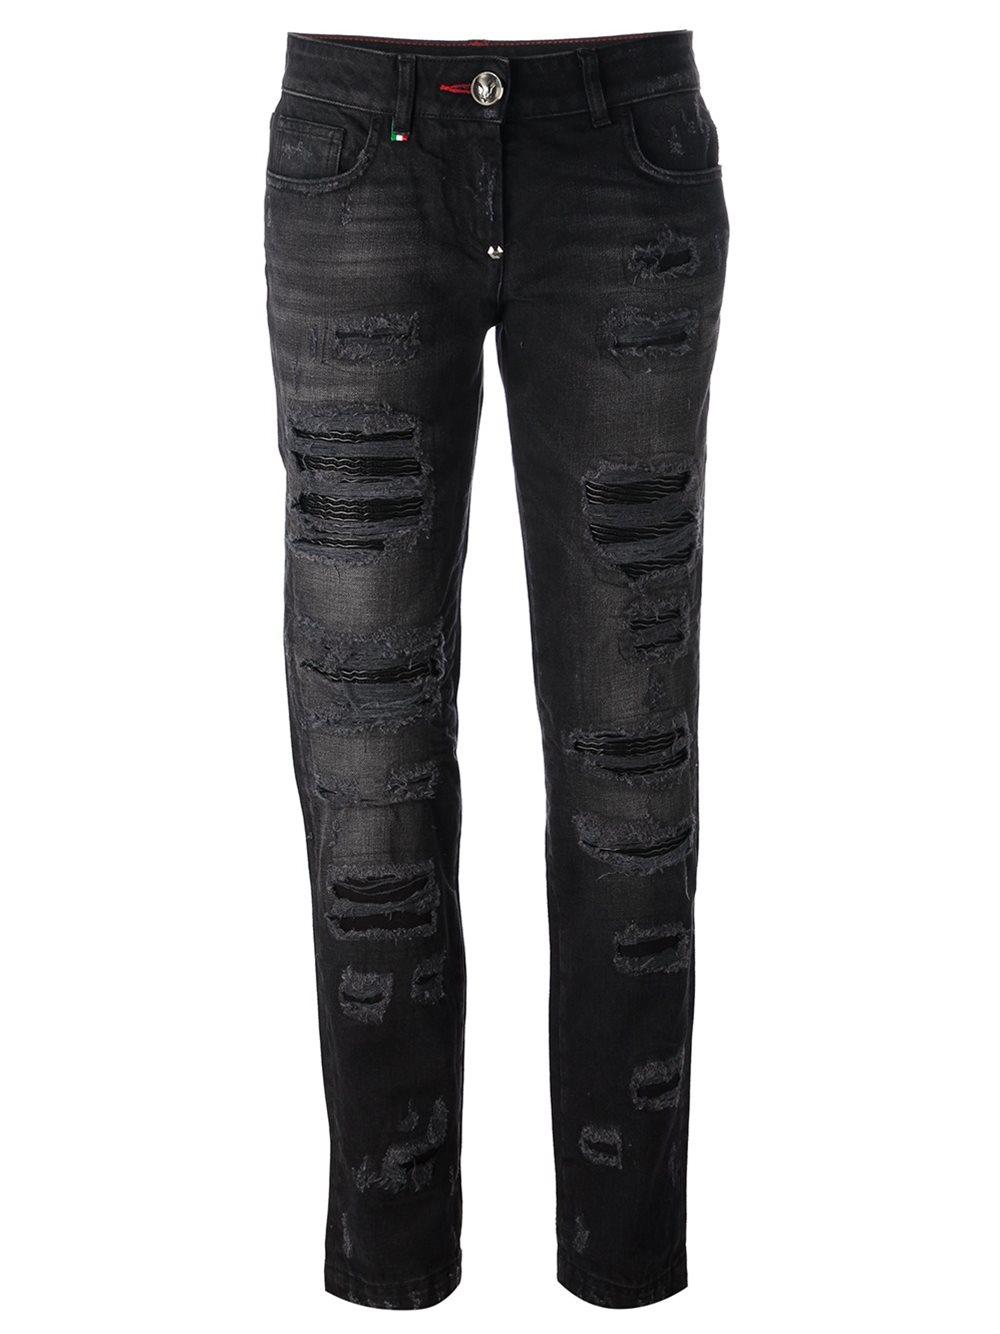 lyst philipp plein distressed boyfriend jeans in black. Black Bedroom Furniture Sets. Home Design Ideas